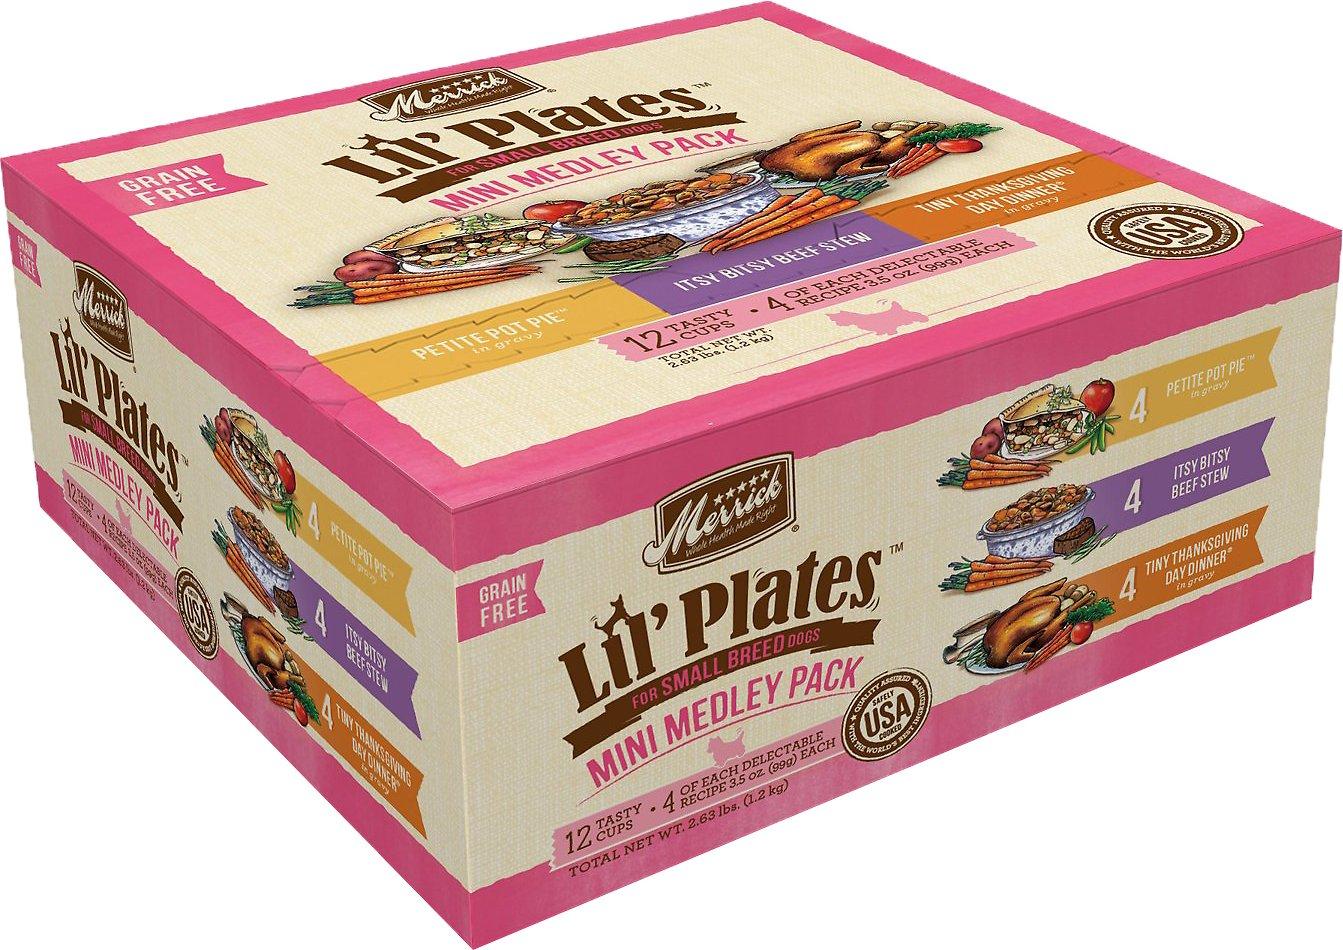 Merrick Lil' Plates Mini Medley Grain-Free Variety Pack Adult Dog Food Trays, 3.5-oz, case of 12